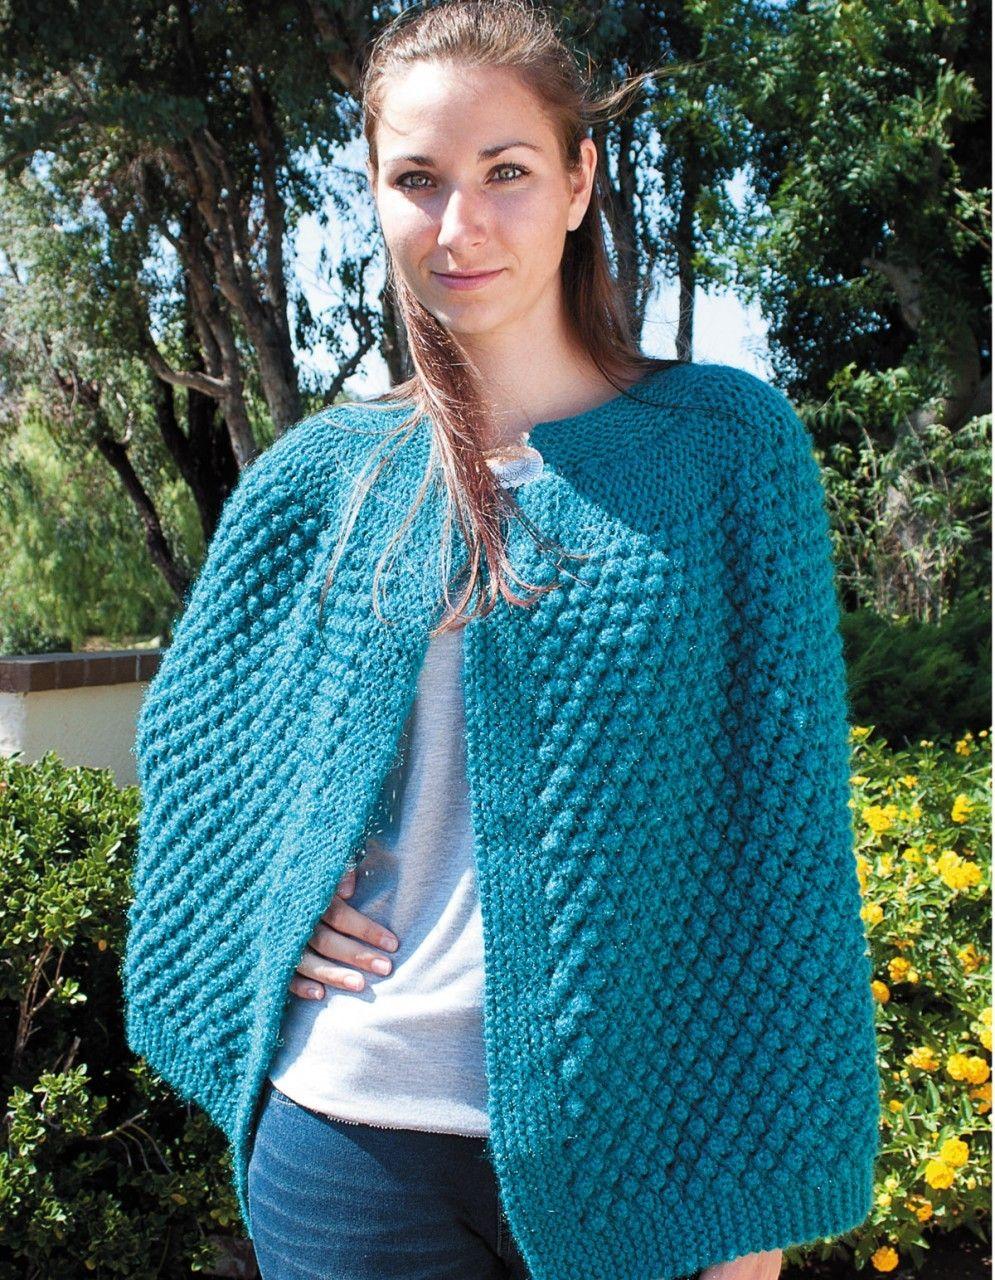 Fantástico Knitting Patterns For Ponchos And Shawls Motivo - Manta ...